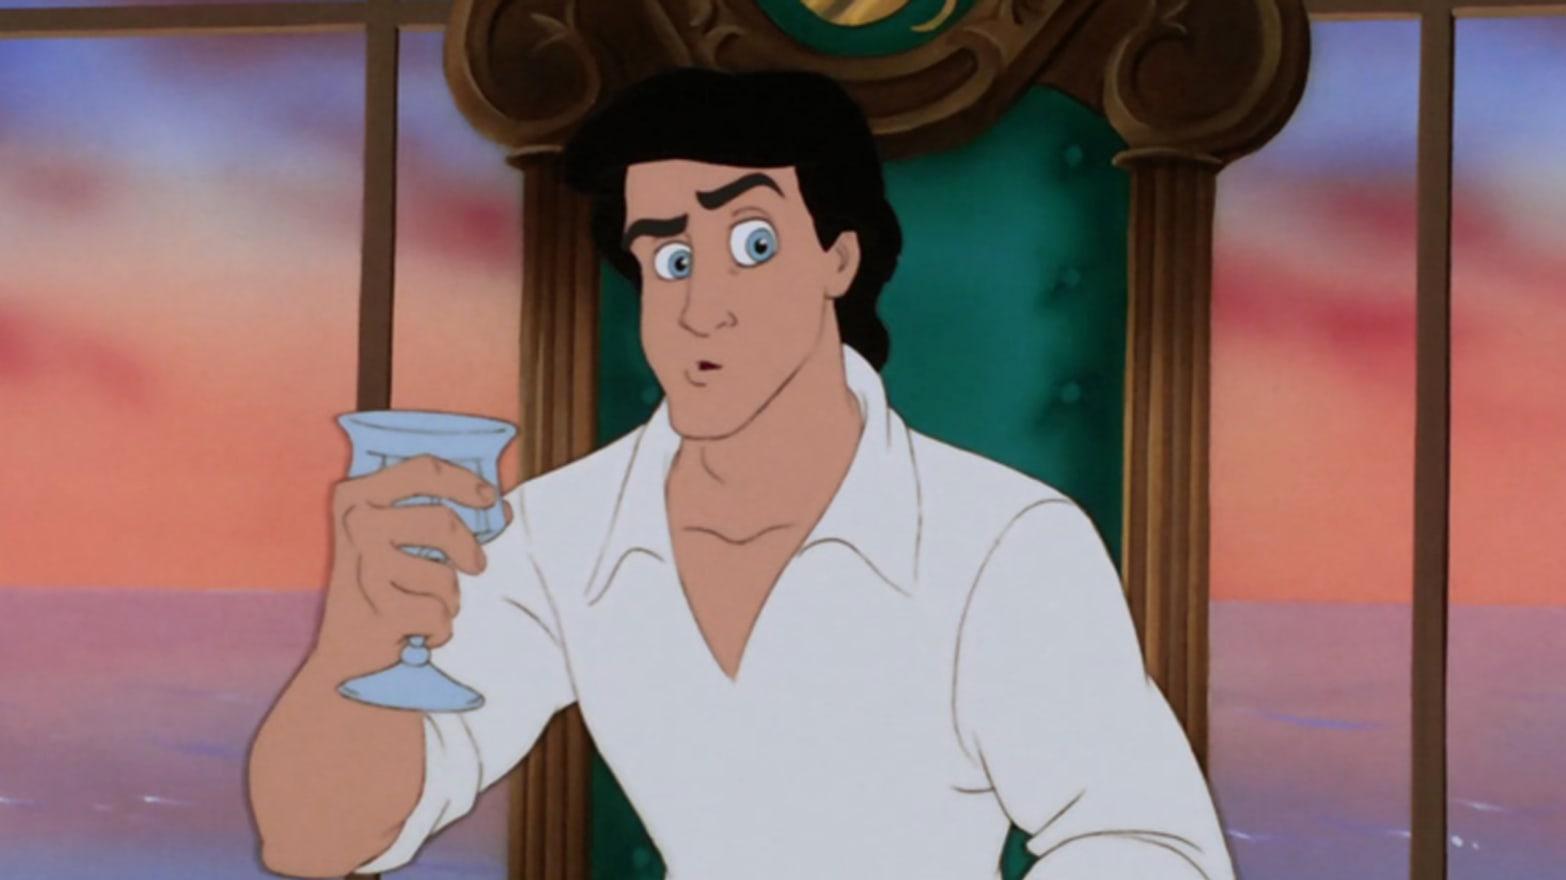 Full Frontal Disney: Feminism's Nudity Double Standard